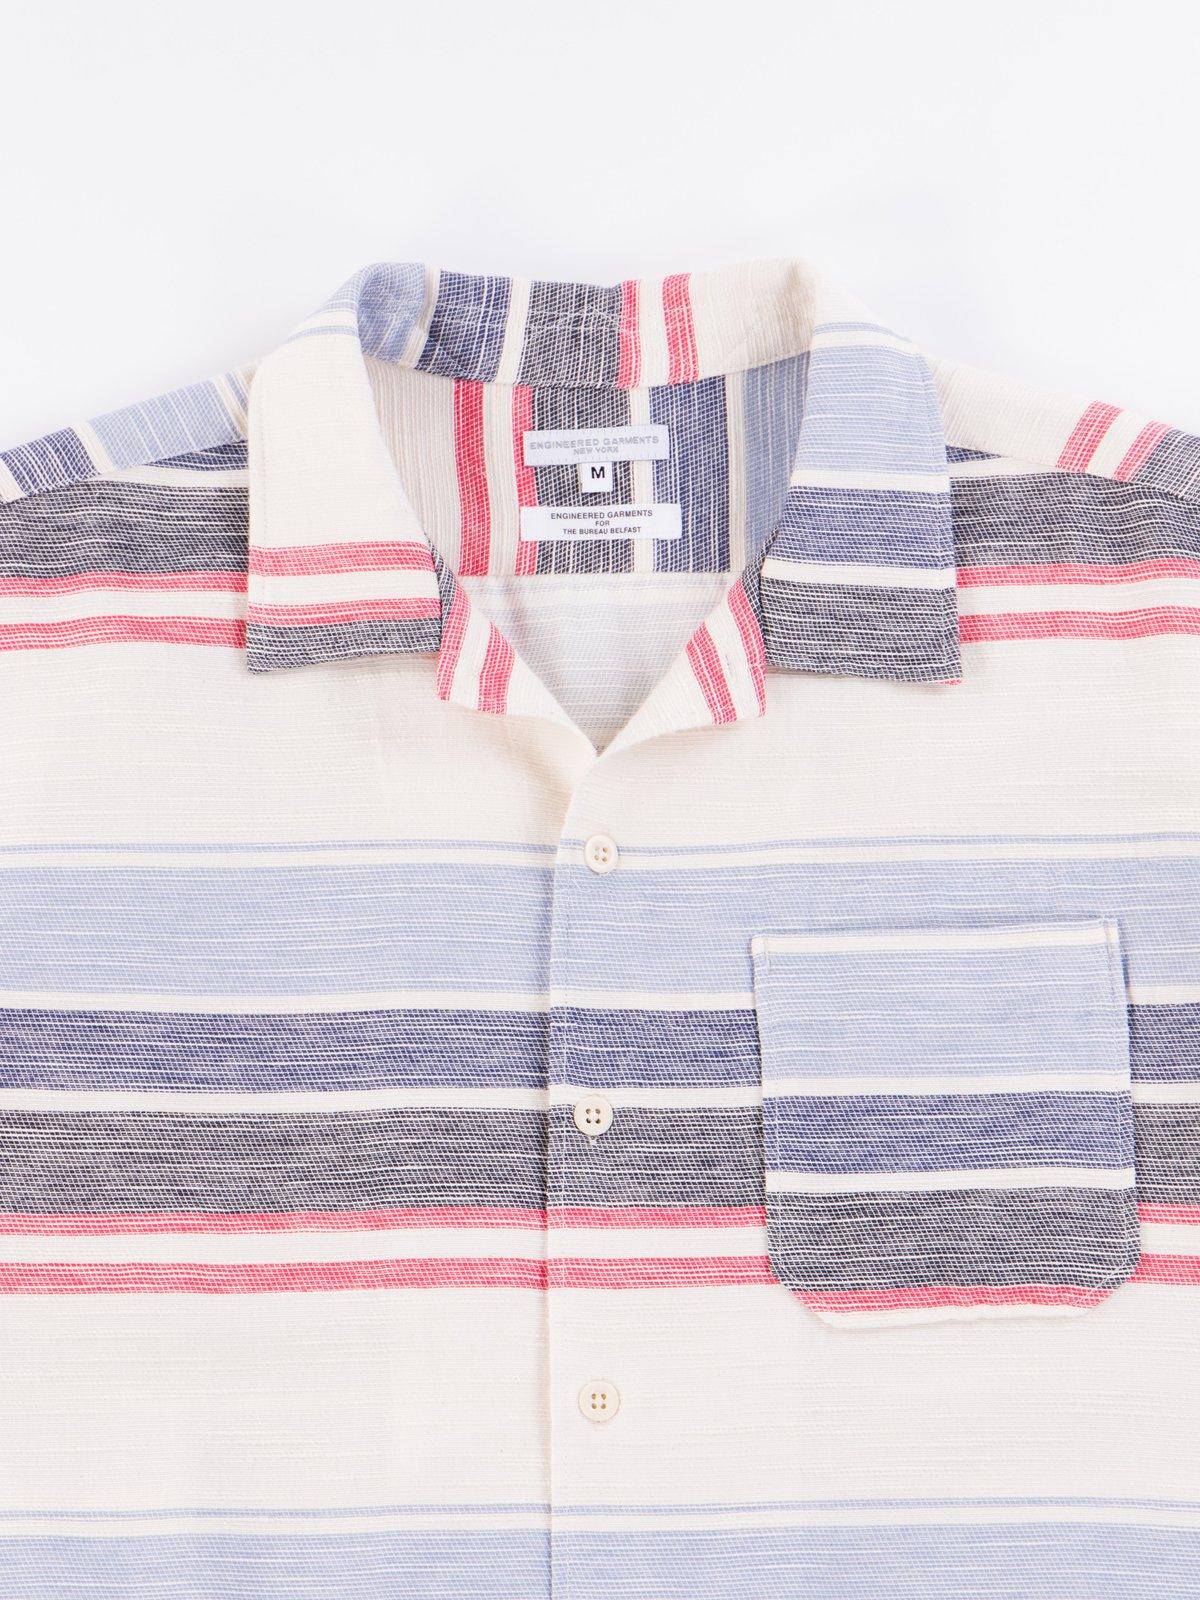 Natural/Red/Blue Horizontal Slab Camp Shirt - Image 3